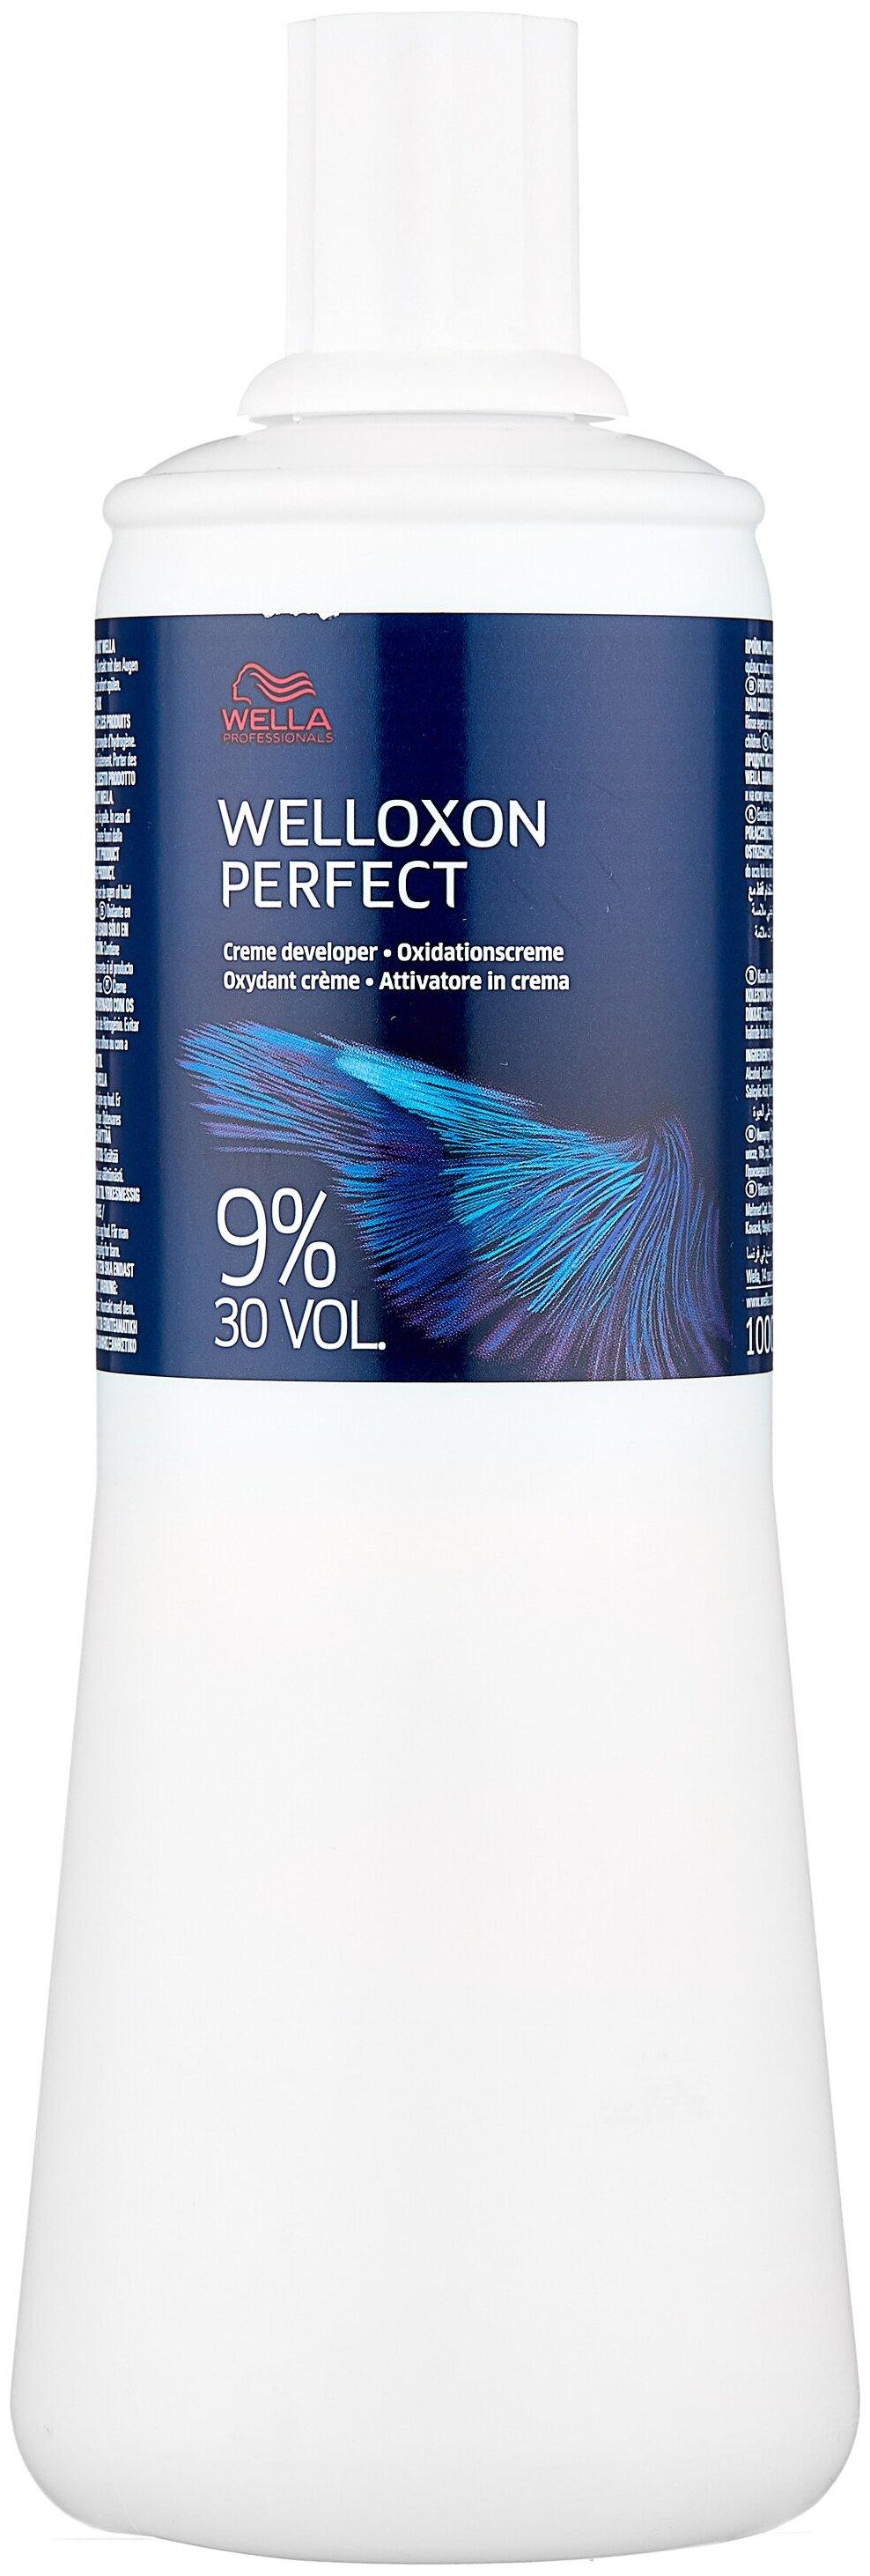 Wella Professionals Welloxon Perfect - текстура: кремовая